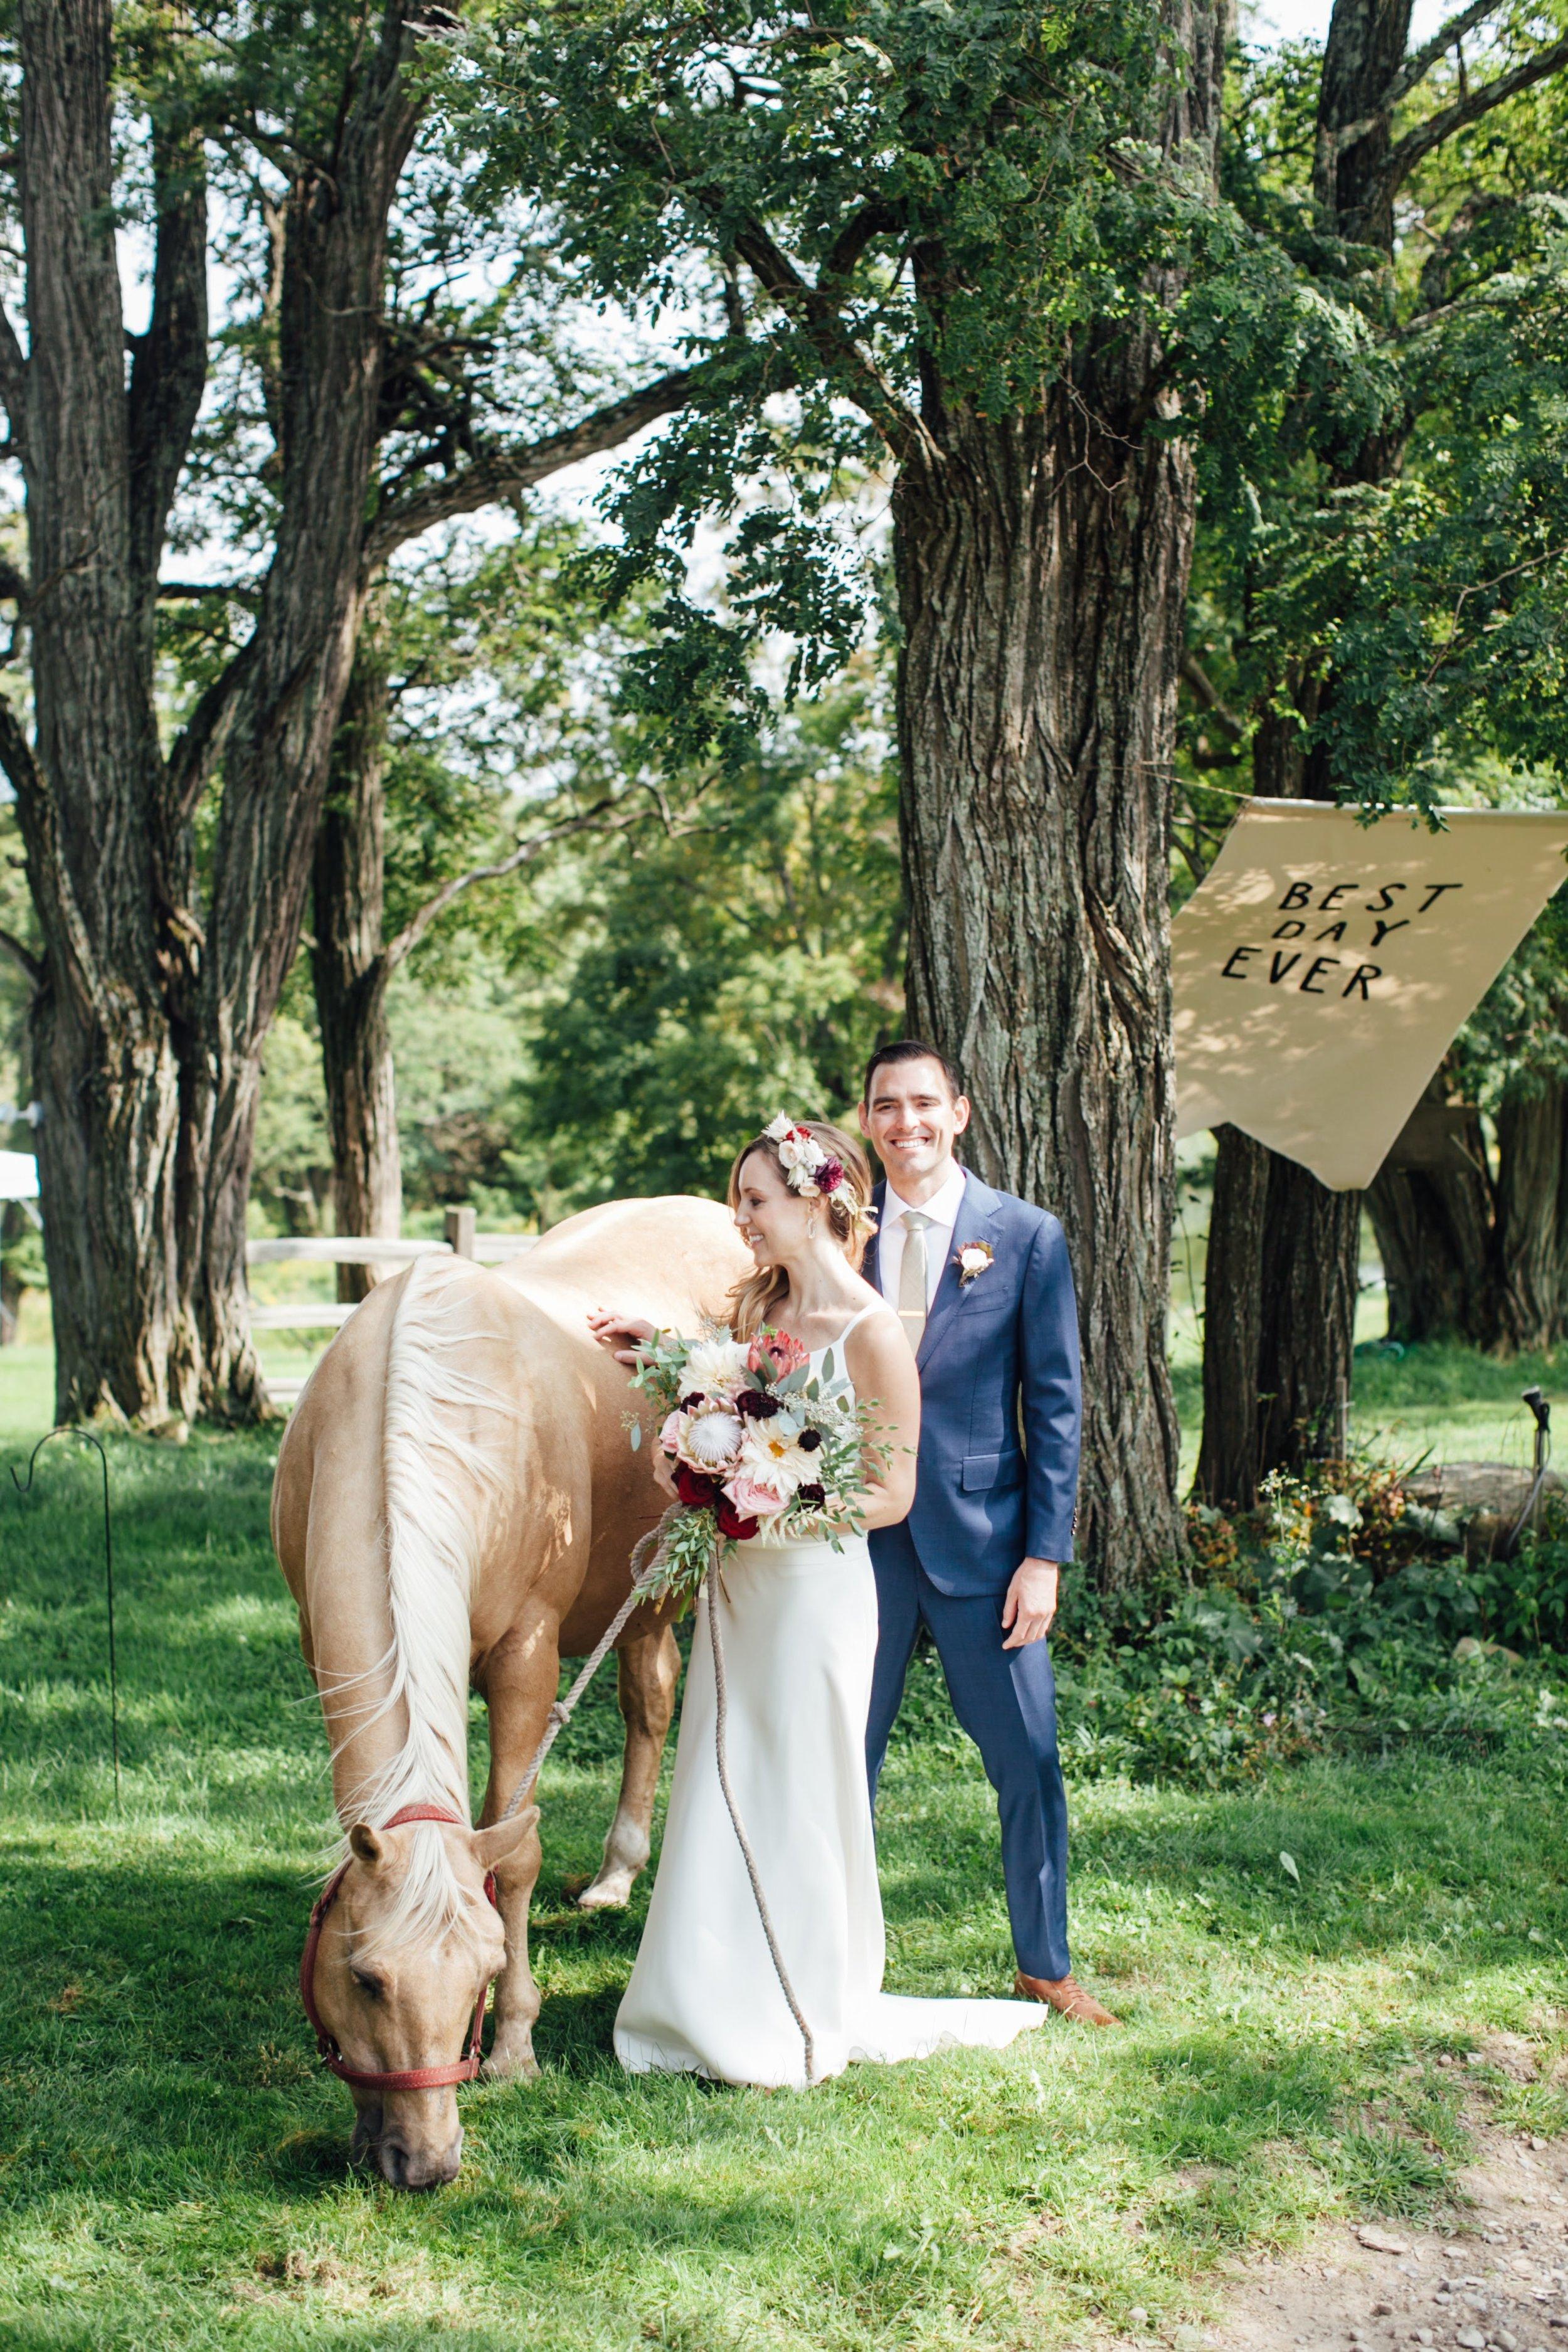 Courtney + Matt Blenheim Hill Farm Catskills NY Wedding Veronica Lola Photography 2017-179.jpg